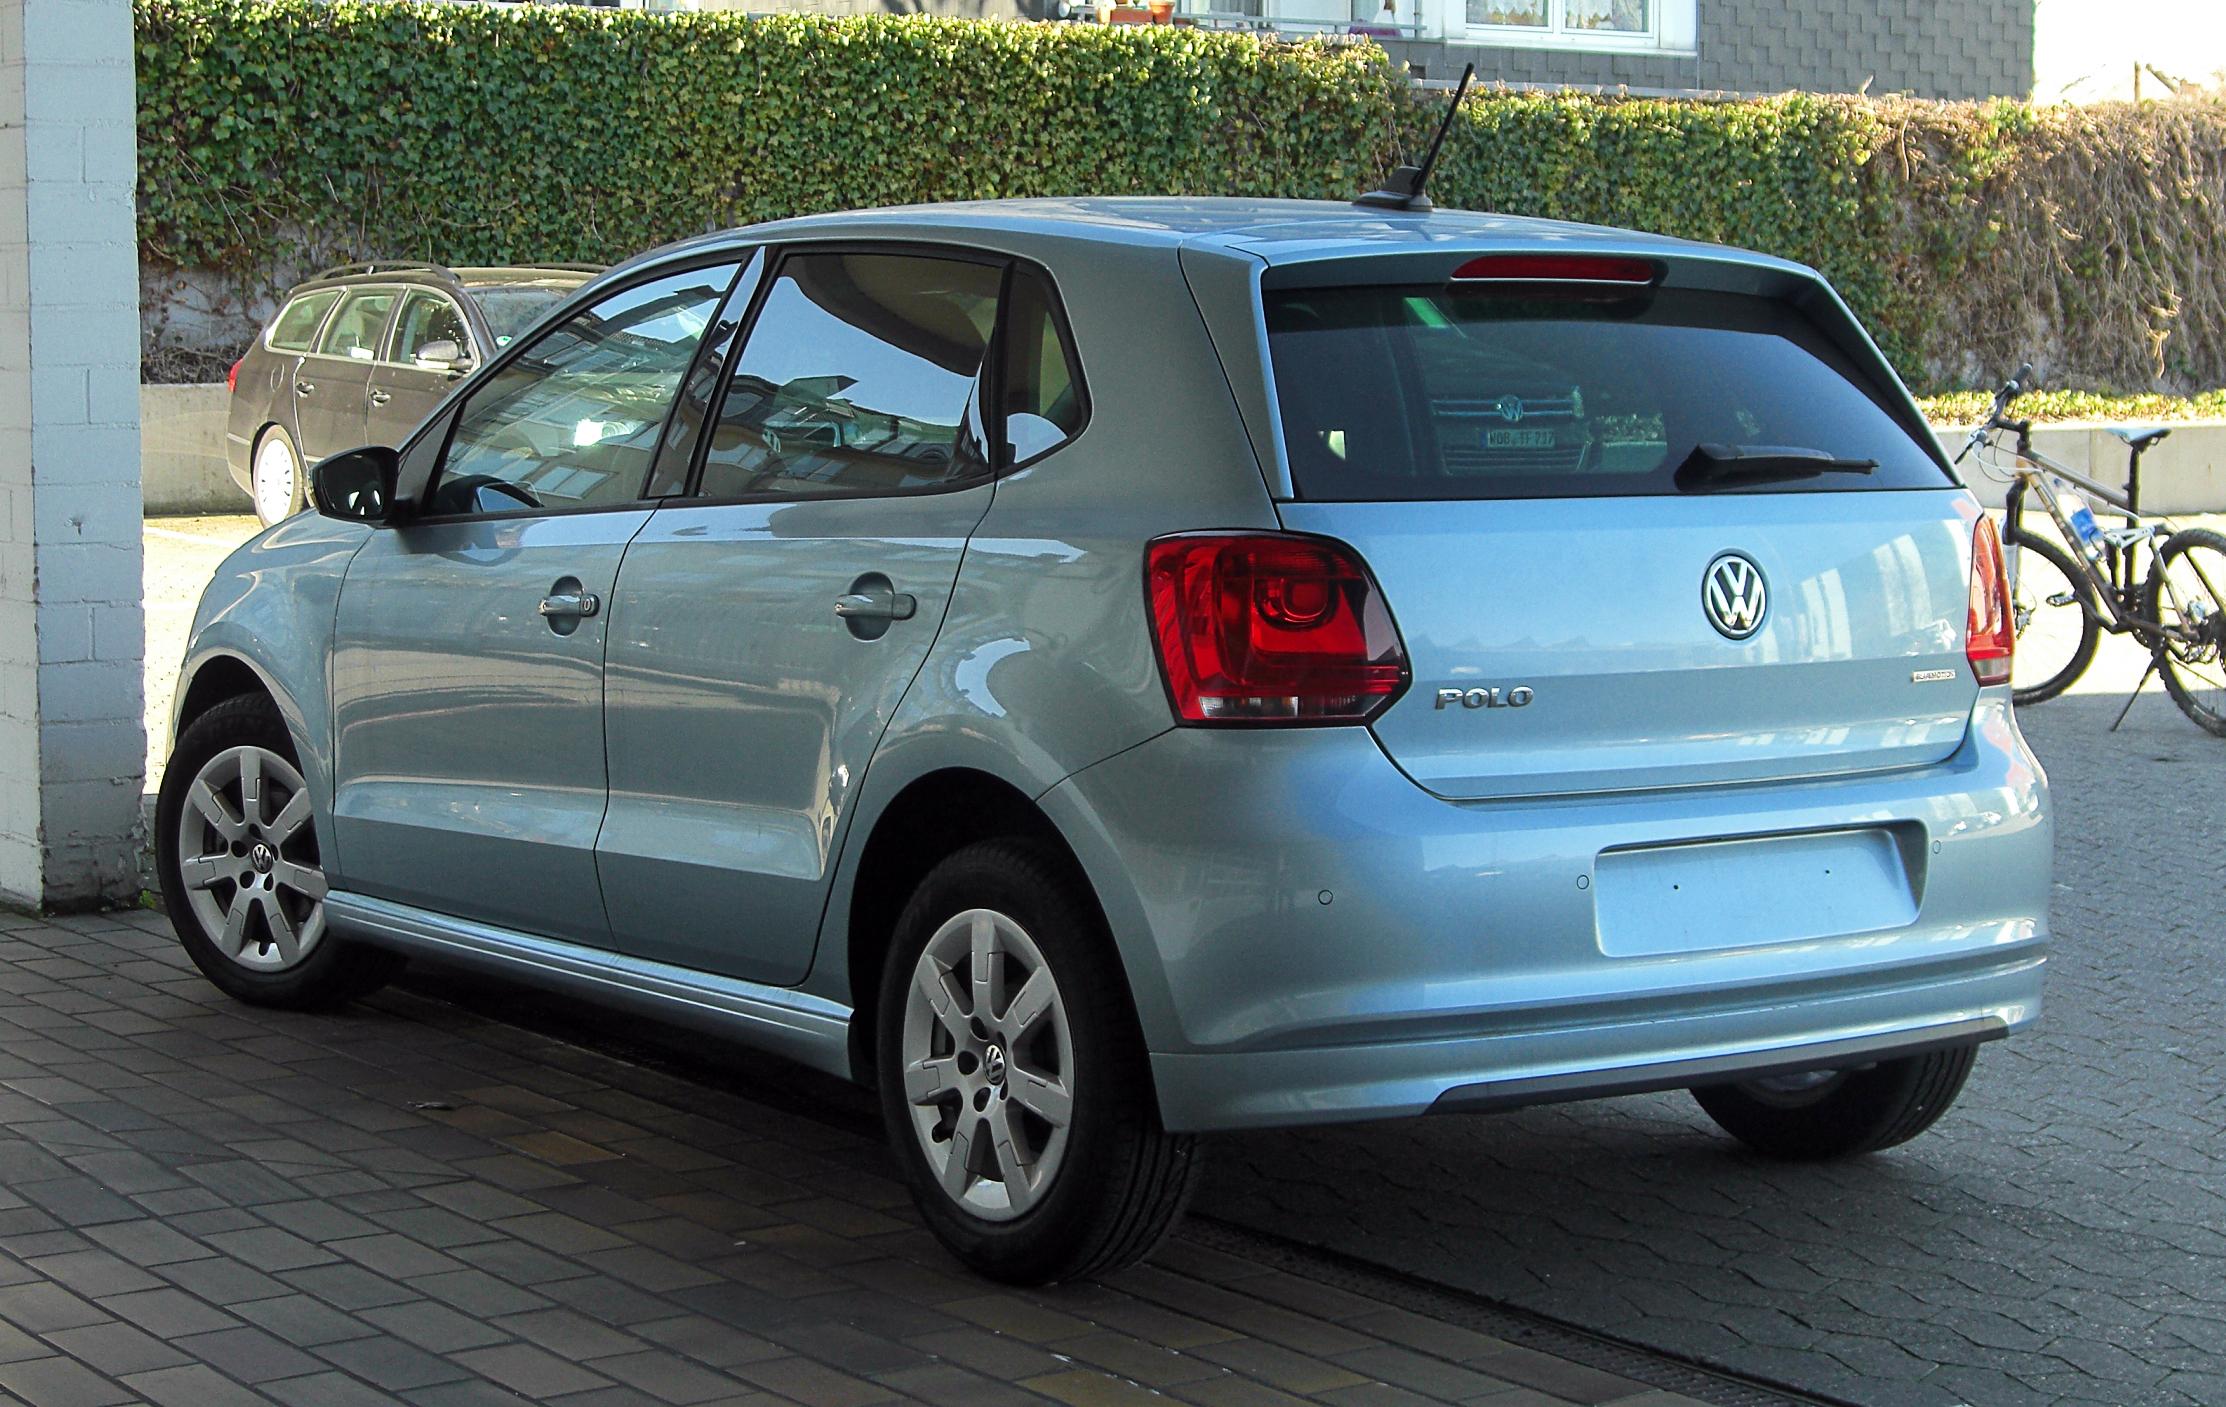 Volkswagen-Polo-1.2TDI-Bluemotion-2015